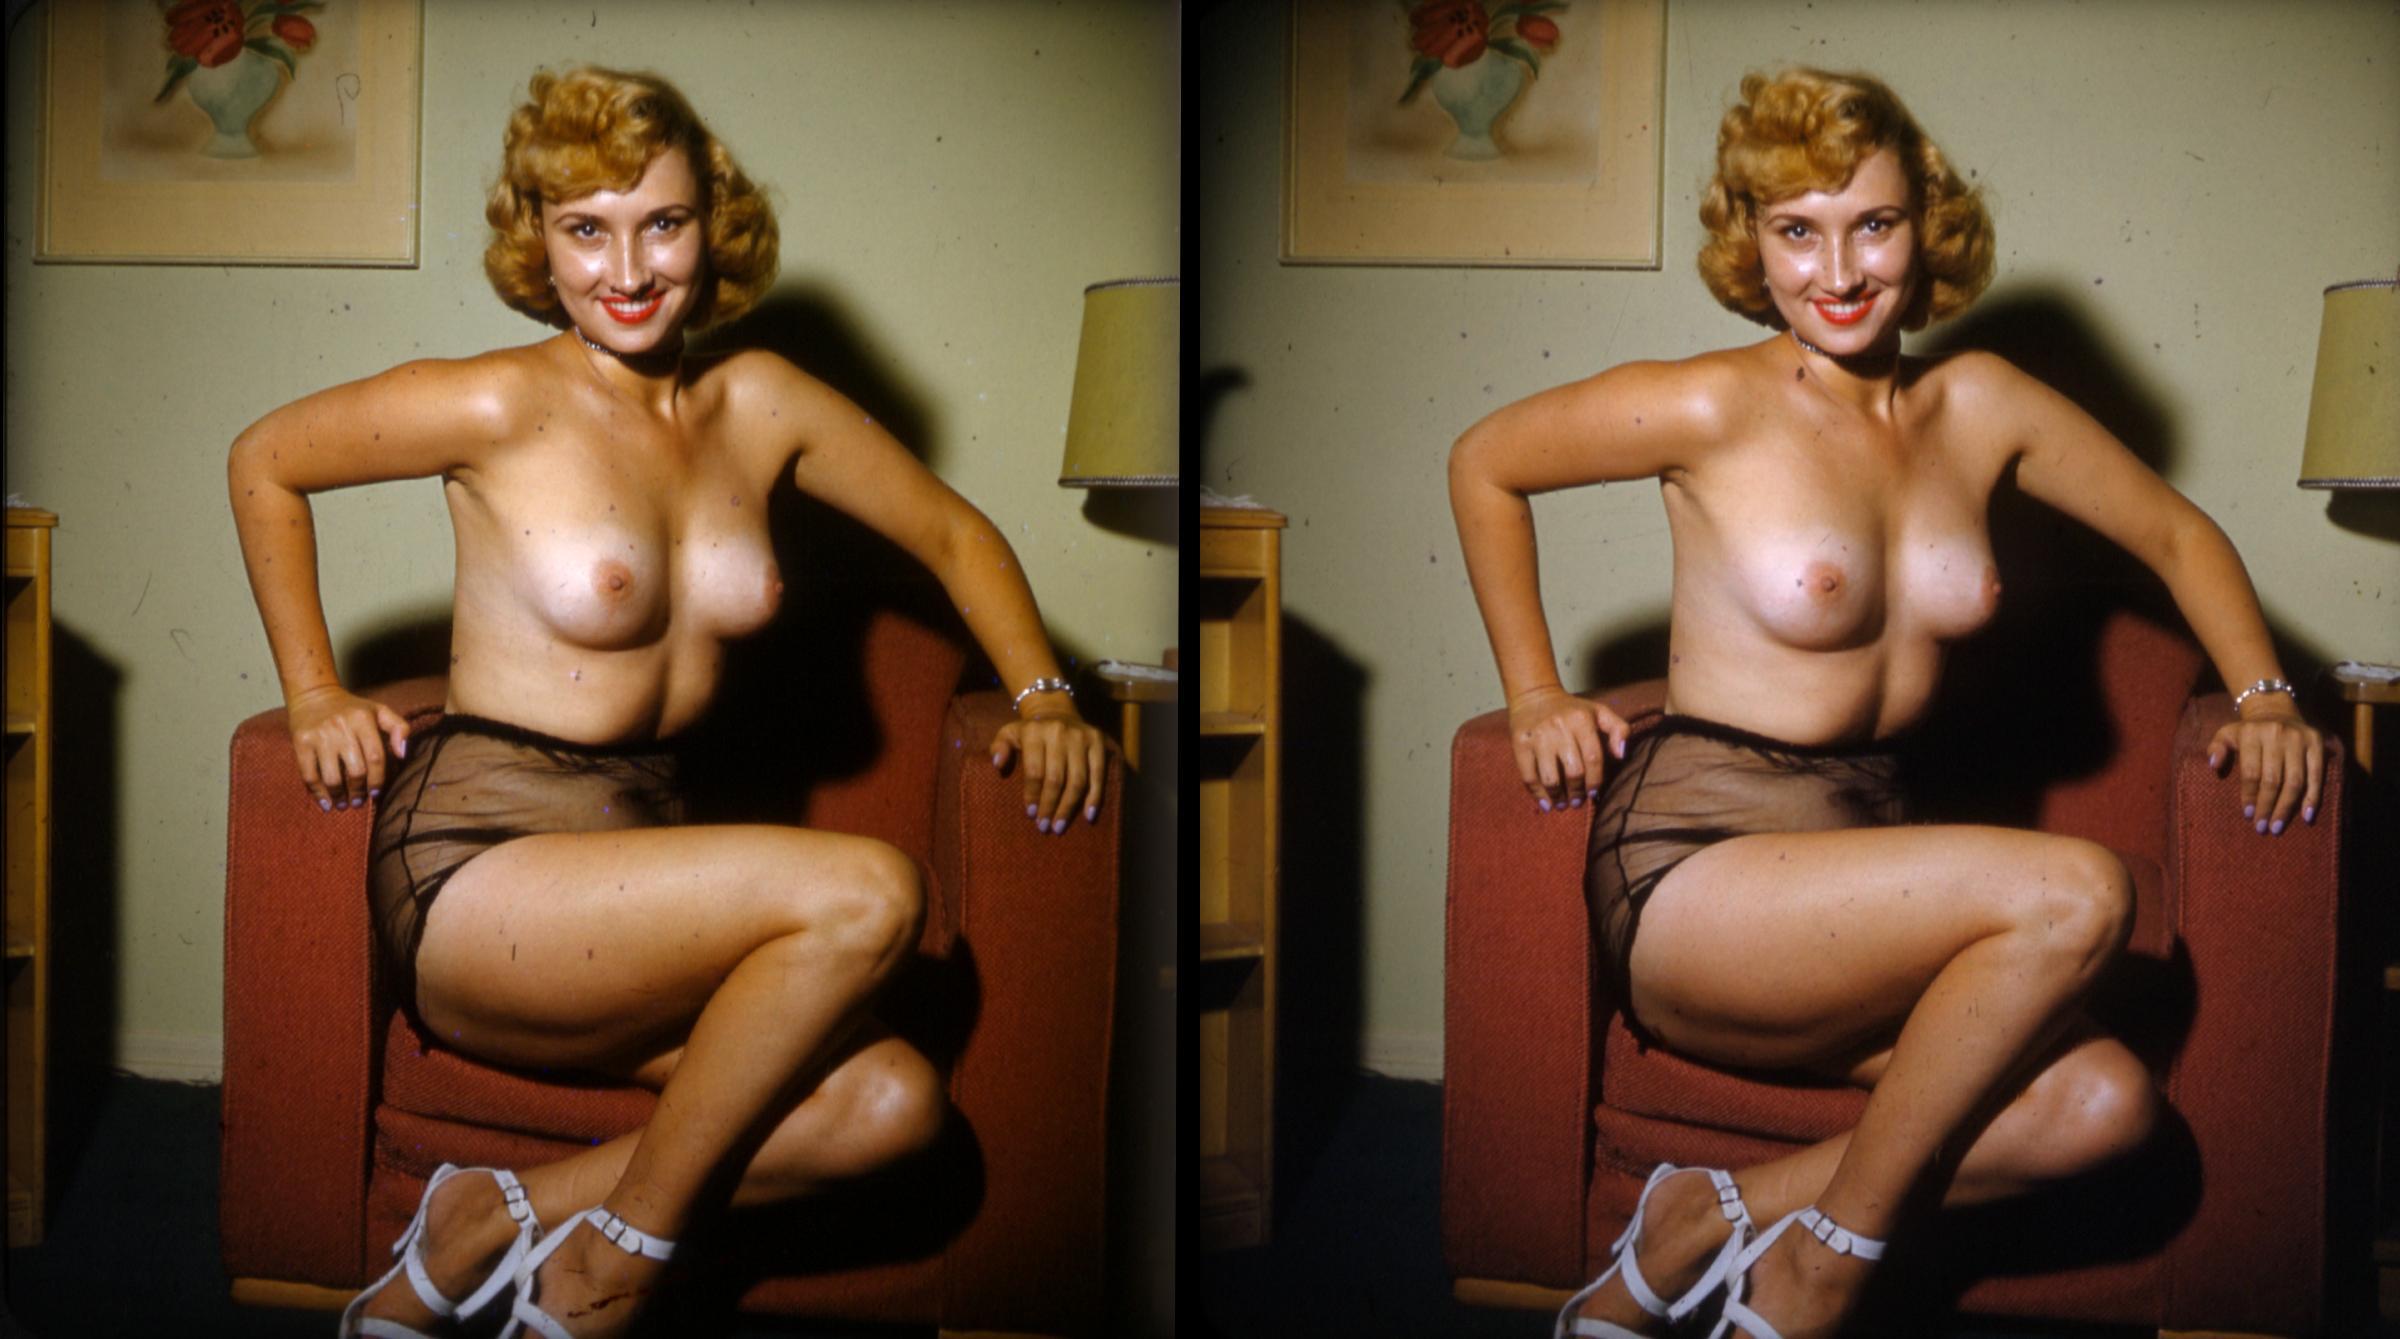 3D Stereo Porn porn stereo pair - inidan sex tube